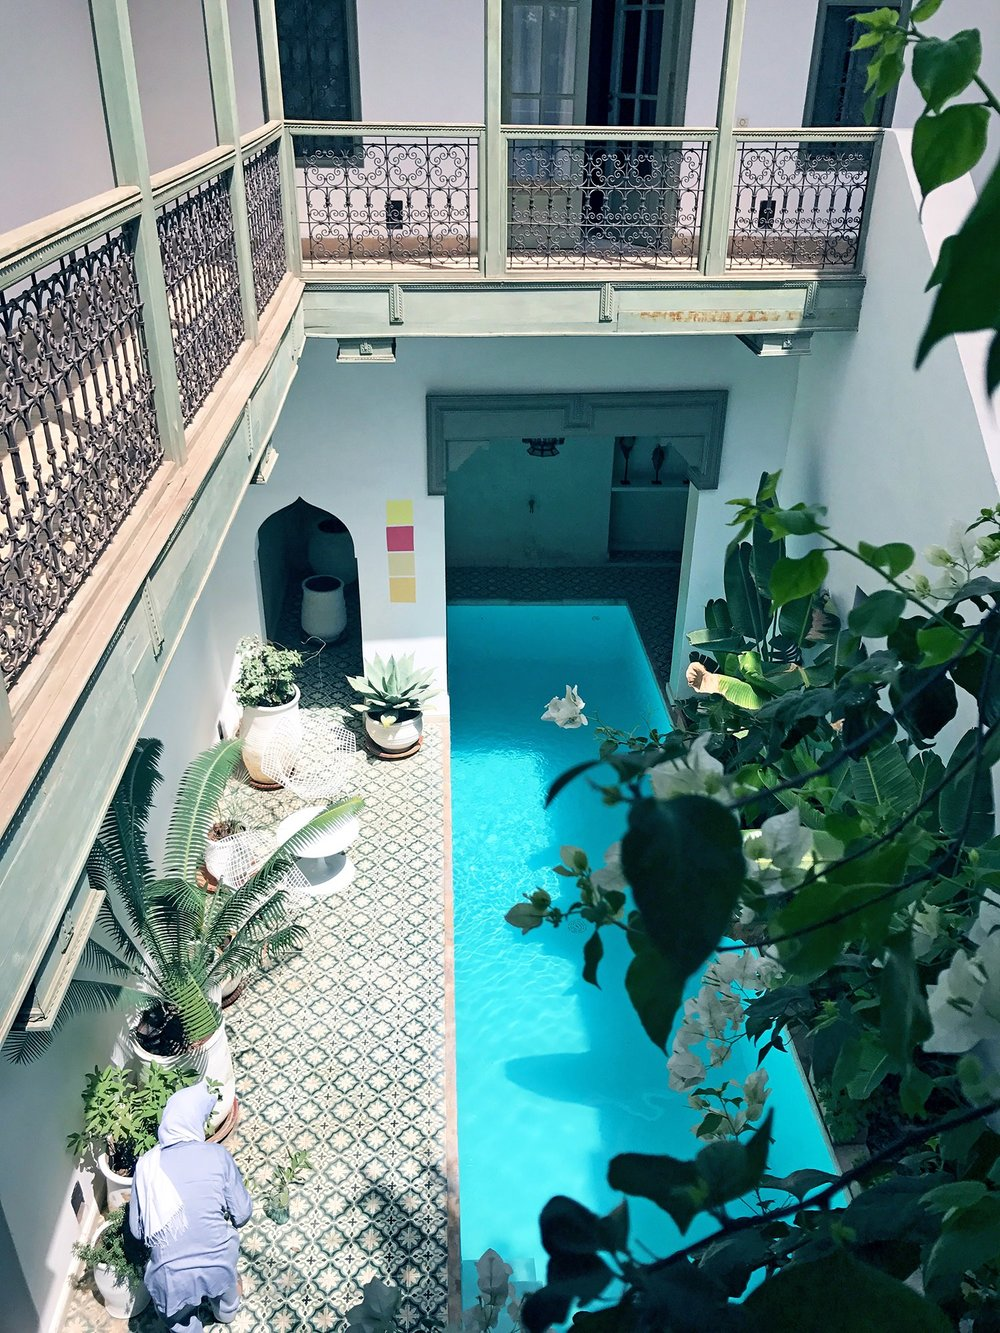 Marrakesh-Riad-Be-Mena-pool.jpg